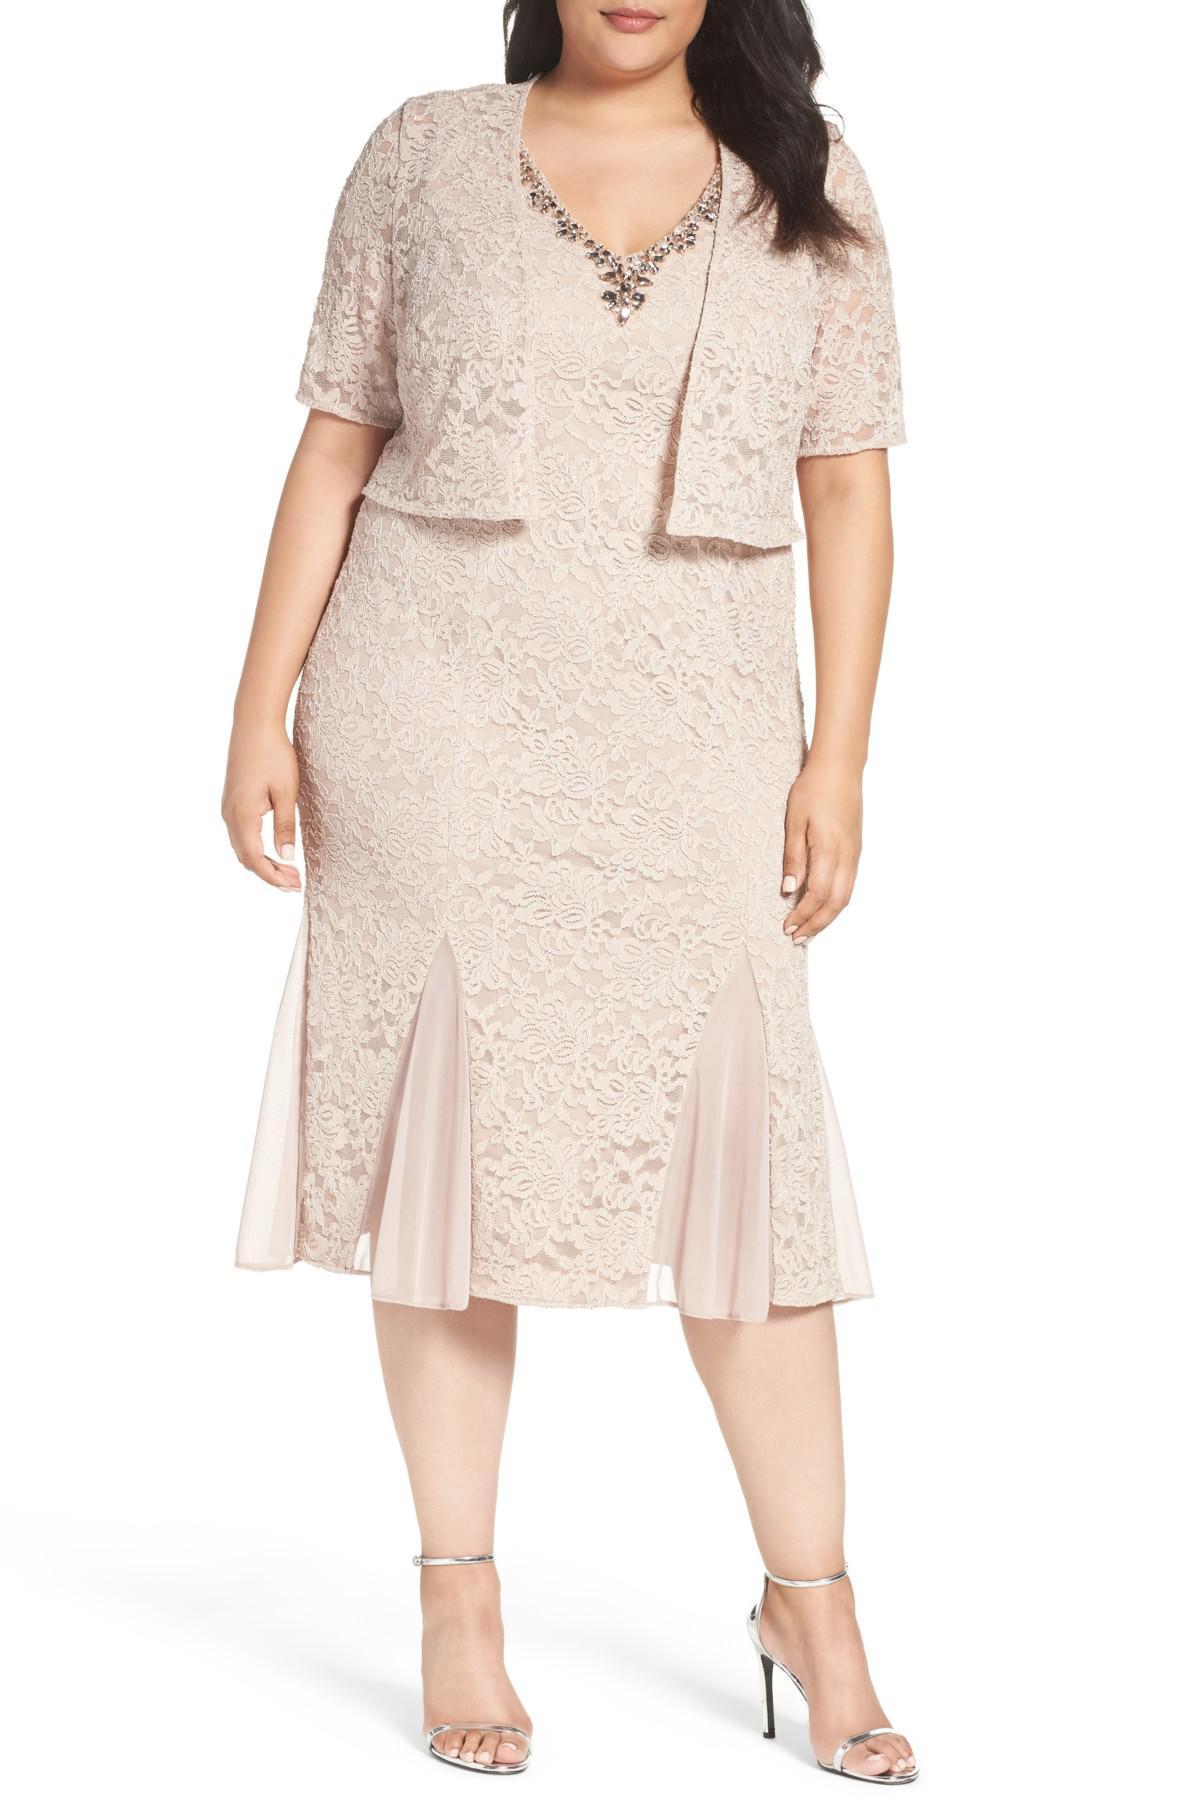 Alex Evenings Multicolor Embellished Lace Tea Length Dress With Bolero  Jacket (plus Size)